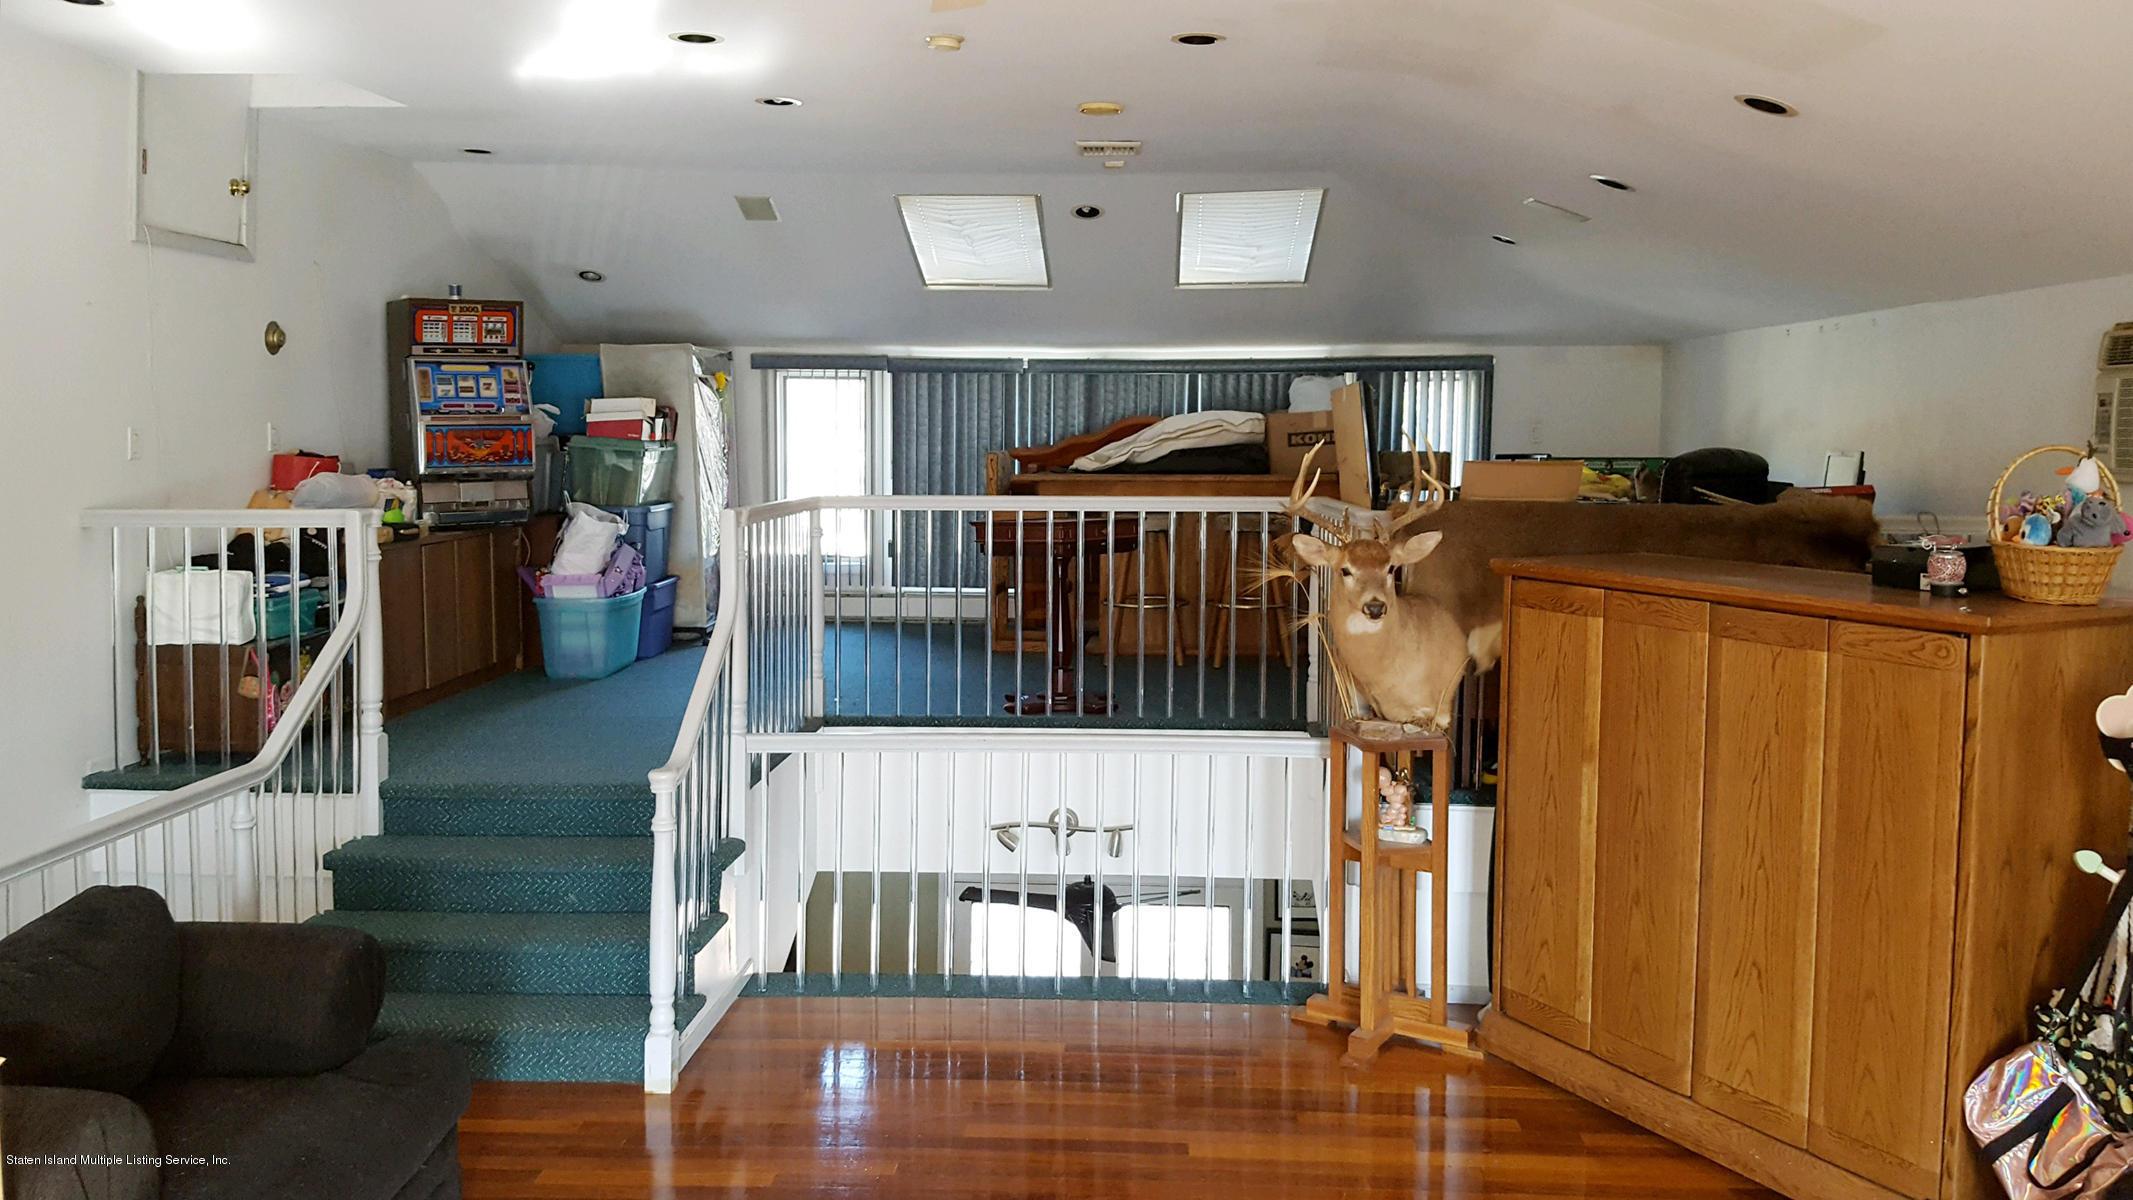 219 Wieland Avenue,Staten Island,New York,10309,United States,5 Bedrooms Bedrooms,10 Rooms Rooms,4 BathroomsBathrooms,Residential,Wieland,1129091